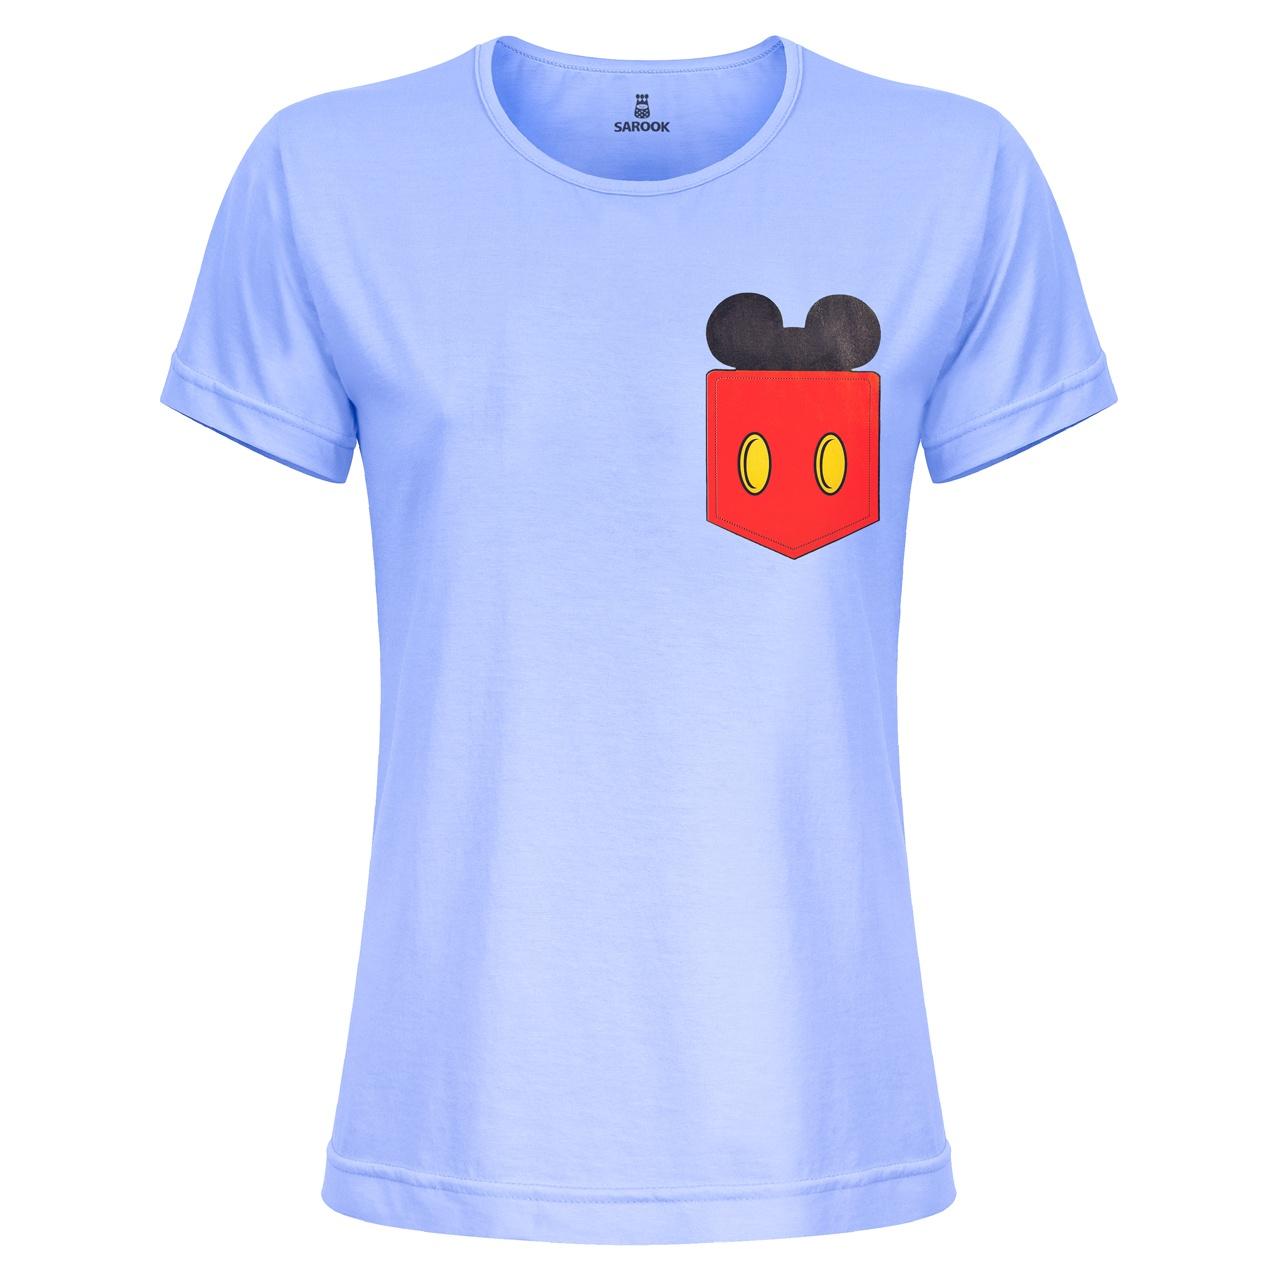 تصویر تی شرت زنانه ساروک مدل TZYUYRCH-Mickey 05 رنگ آبی